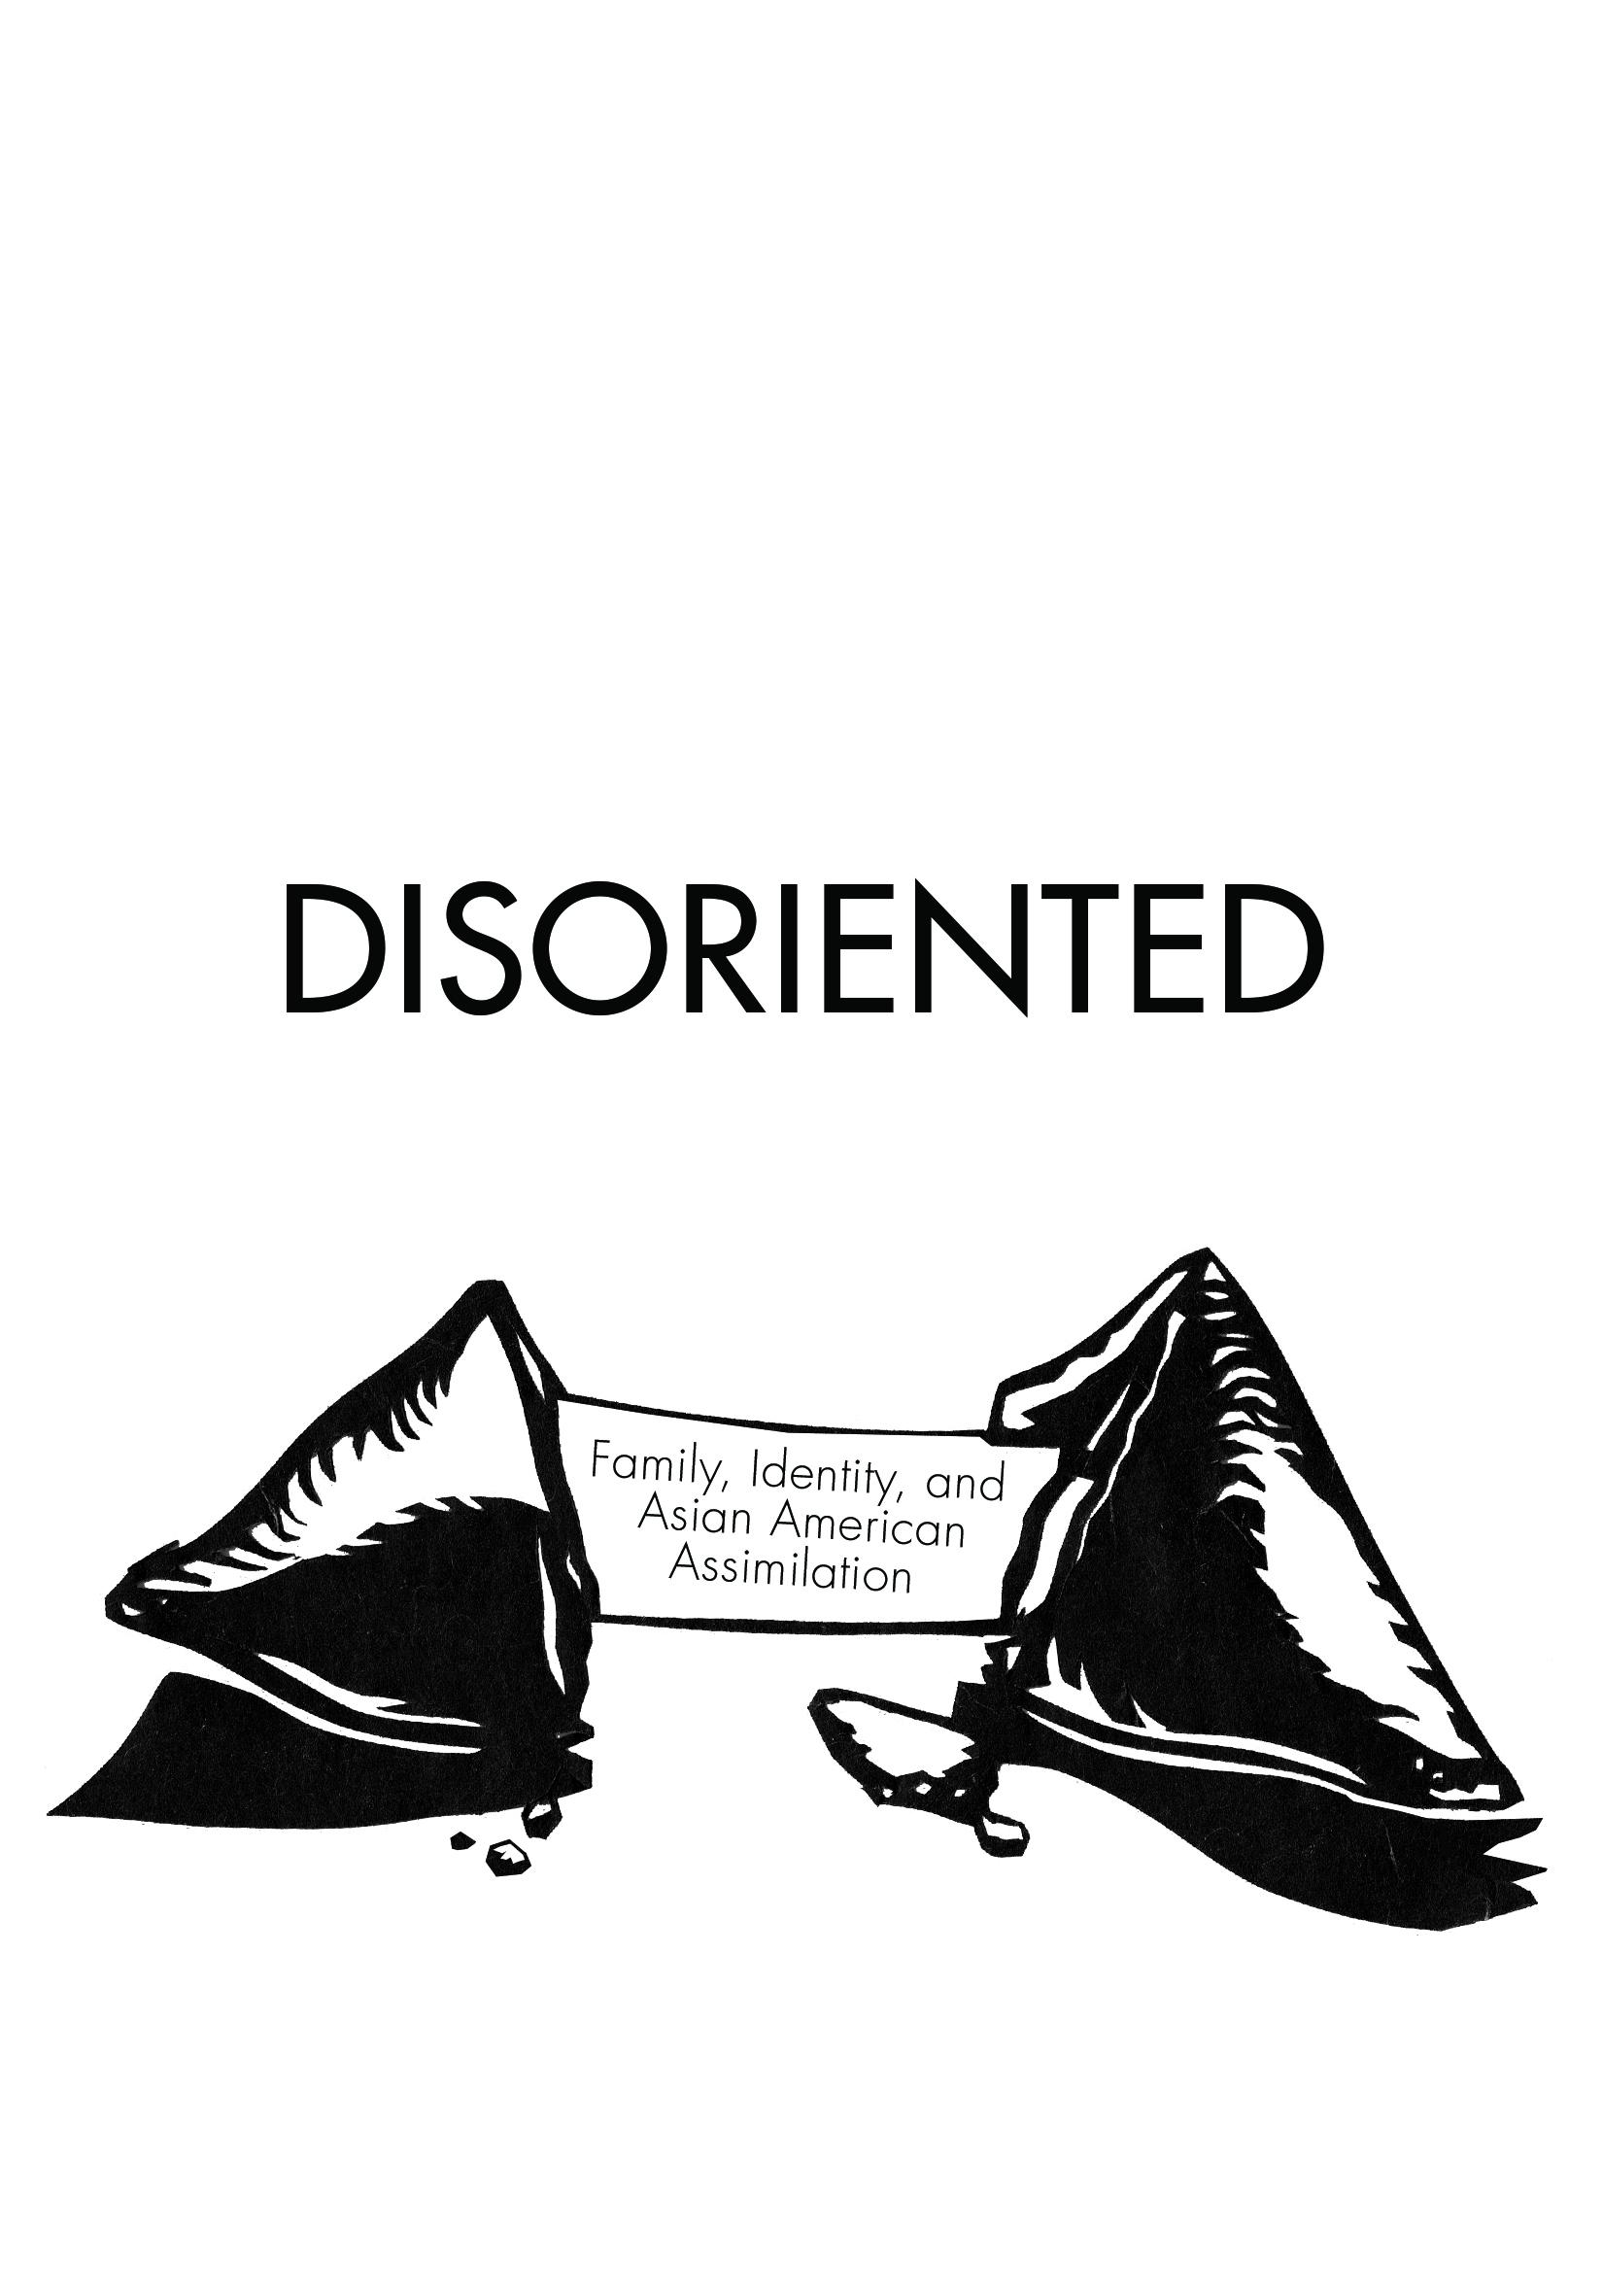 disoriented 1.jpg